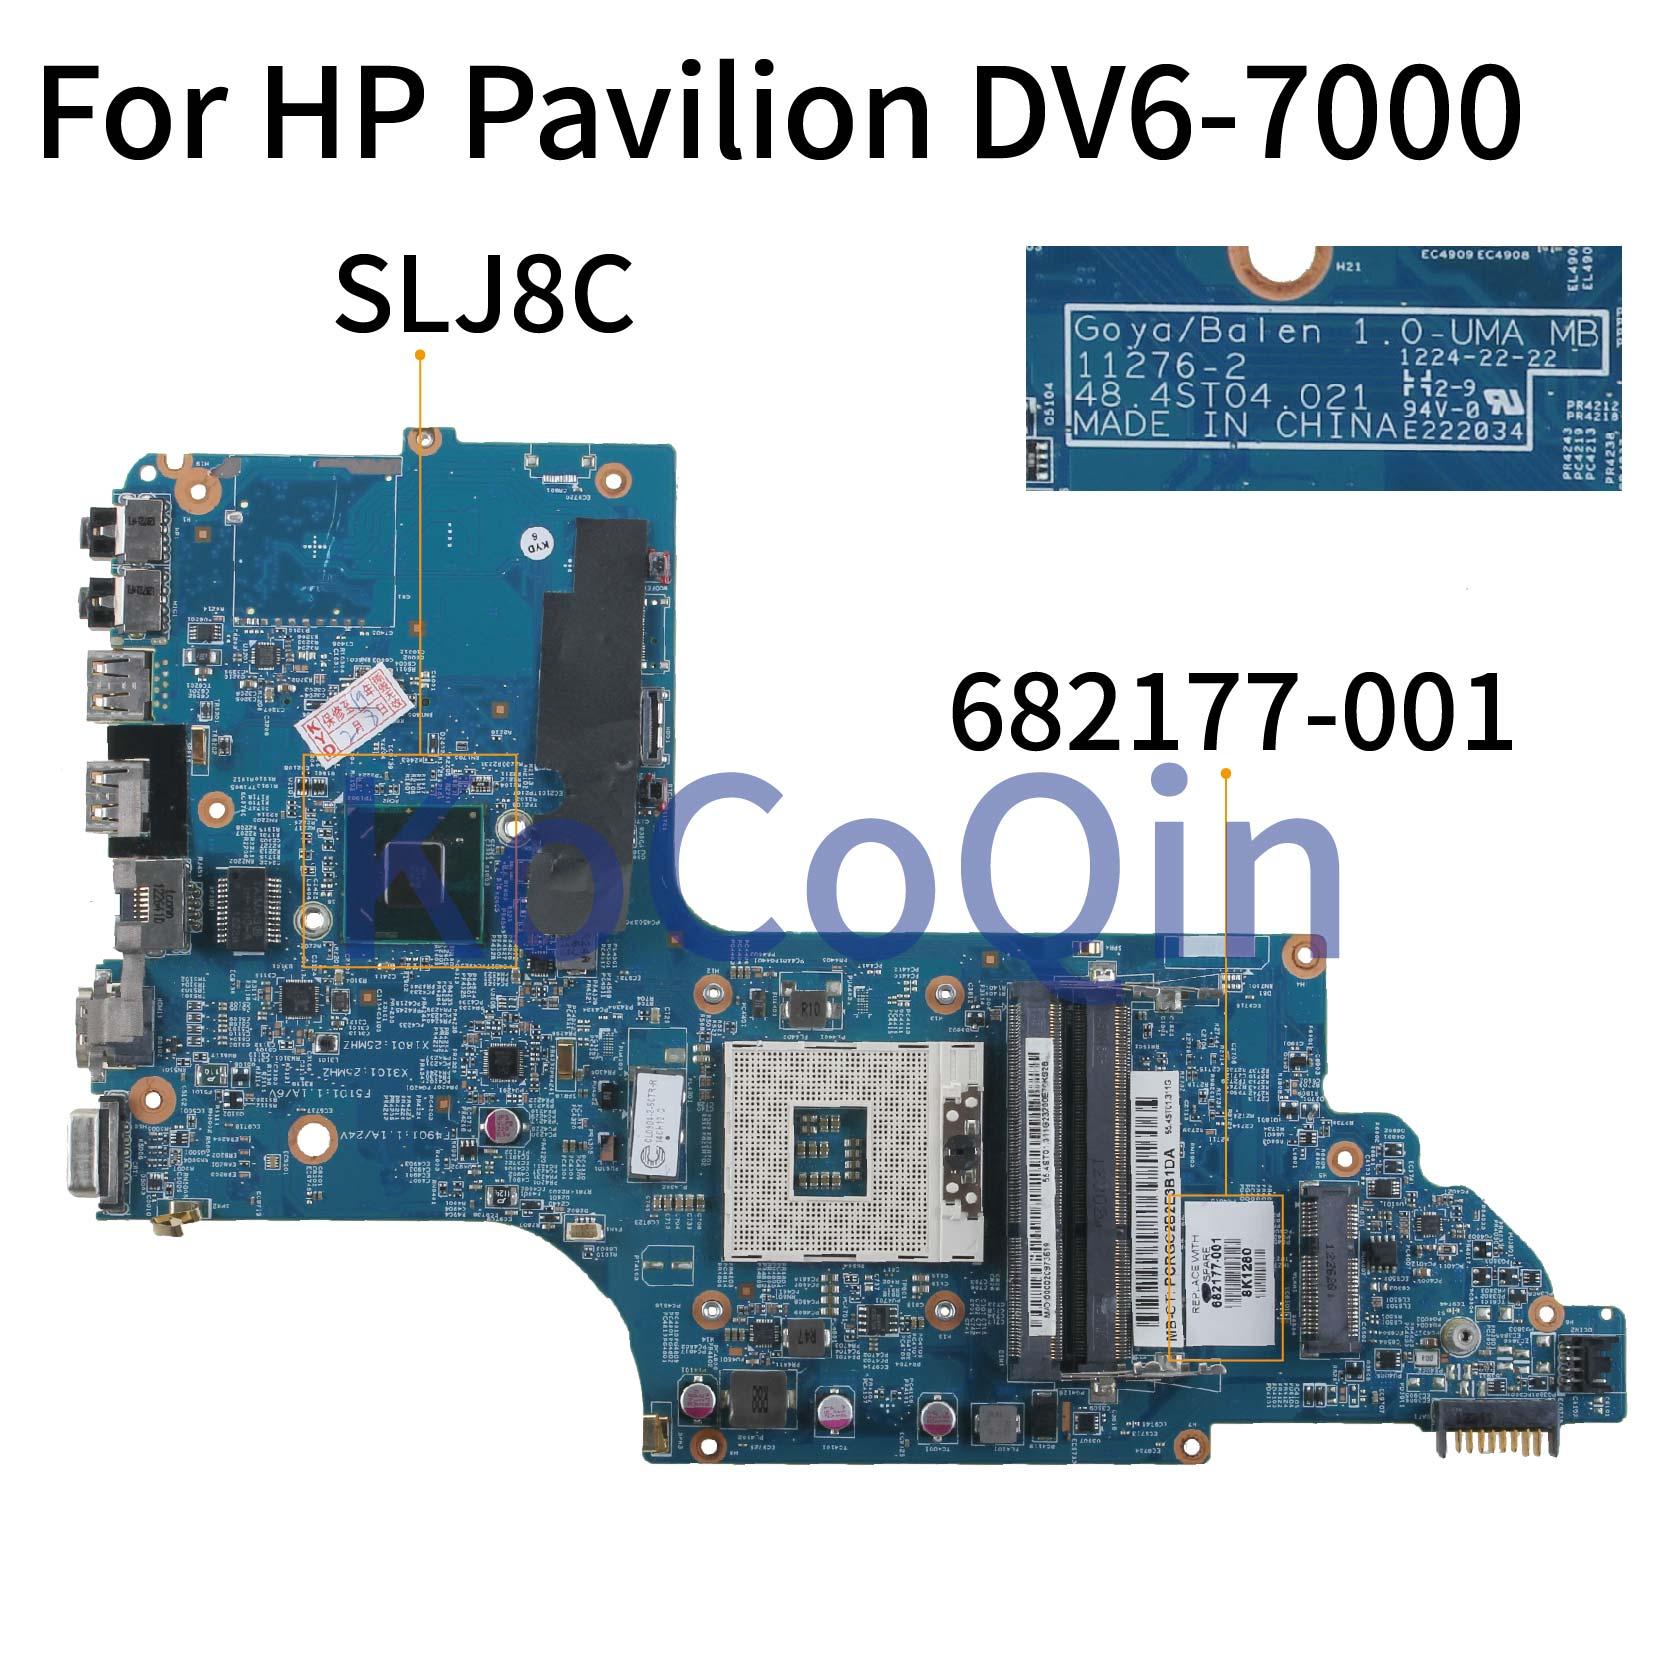 KoCoQin لوحة أم للكمبيوتر المحمول HP بافيليون DV6-7000 HM77 Core SLJ8C اللوحة الرئيسية 682177-001 682177-501 11276-2 48.4ST04.021 تم اختبارها